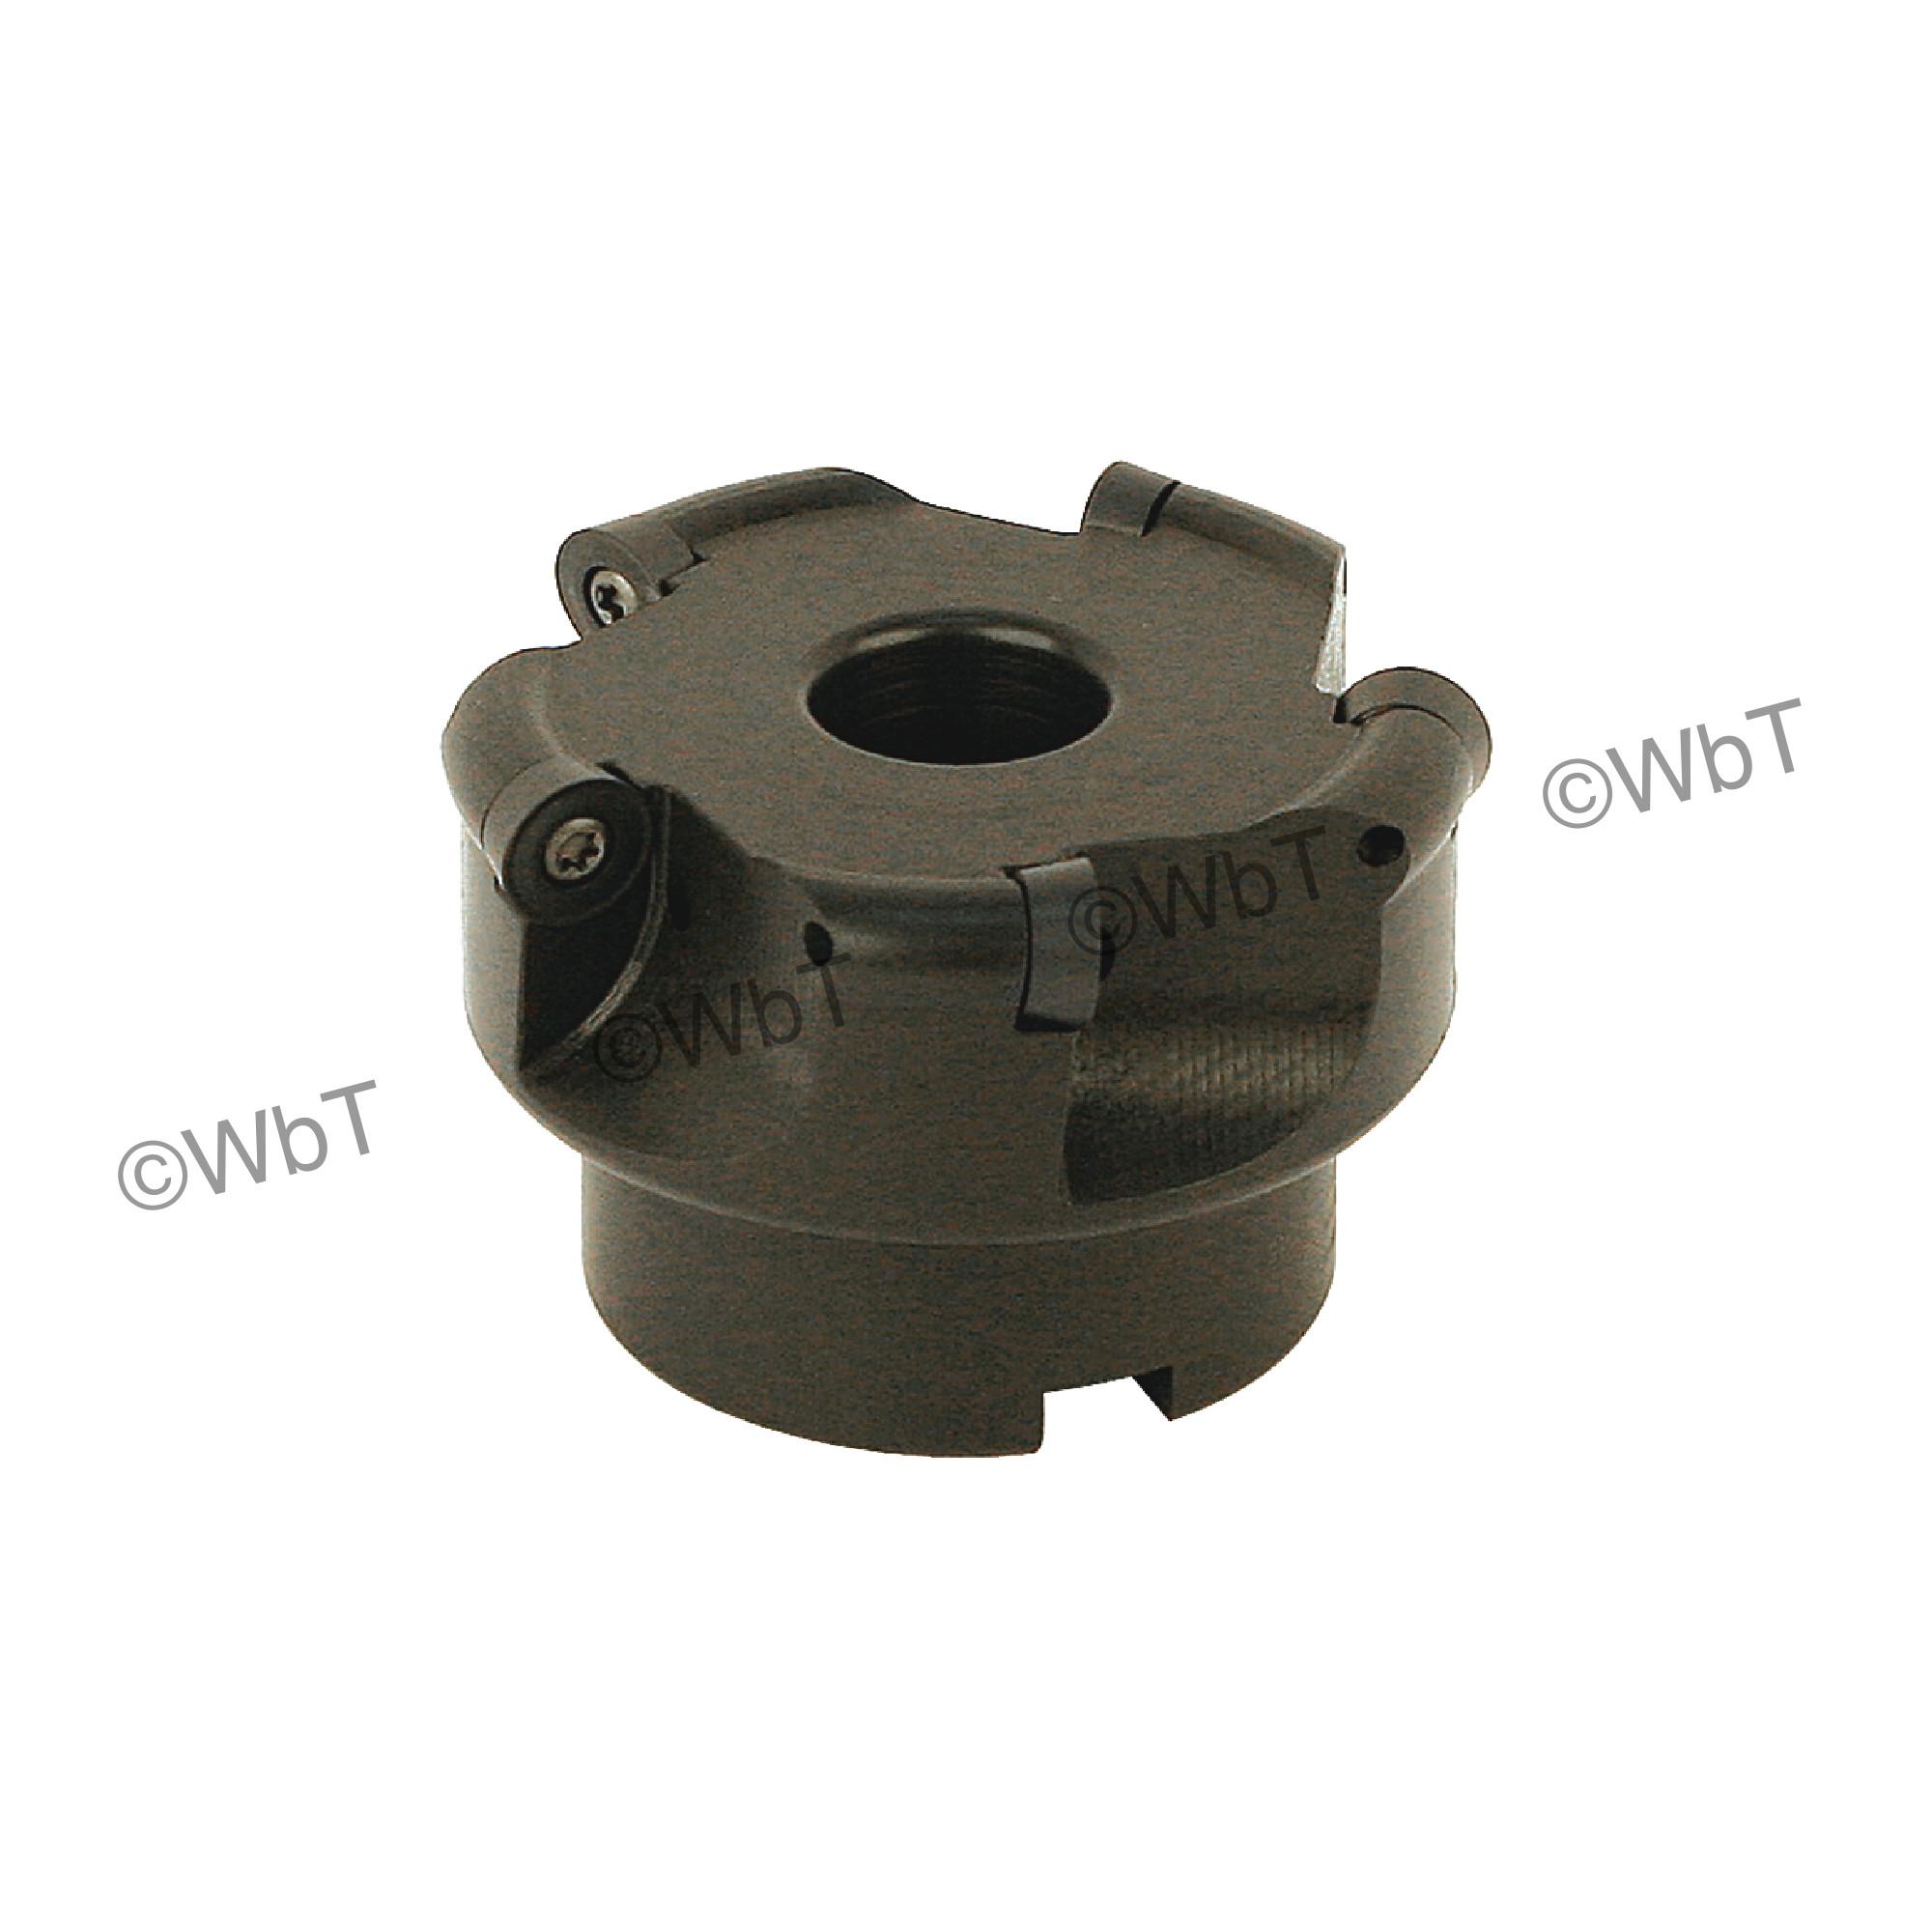 "AKUMA - 3.000"" Face Mill Set / Includes: (1) RPC.43.300R-5 (3.0""ø) & (10) RPMT1204M0S-M1 PM20M Coated Inserts / R"